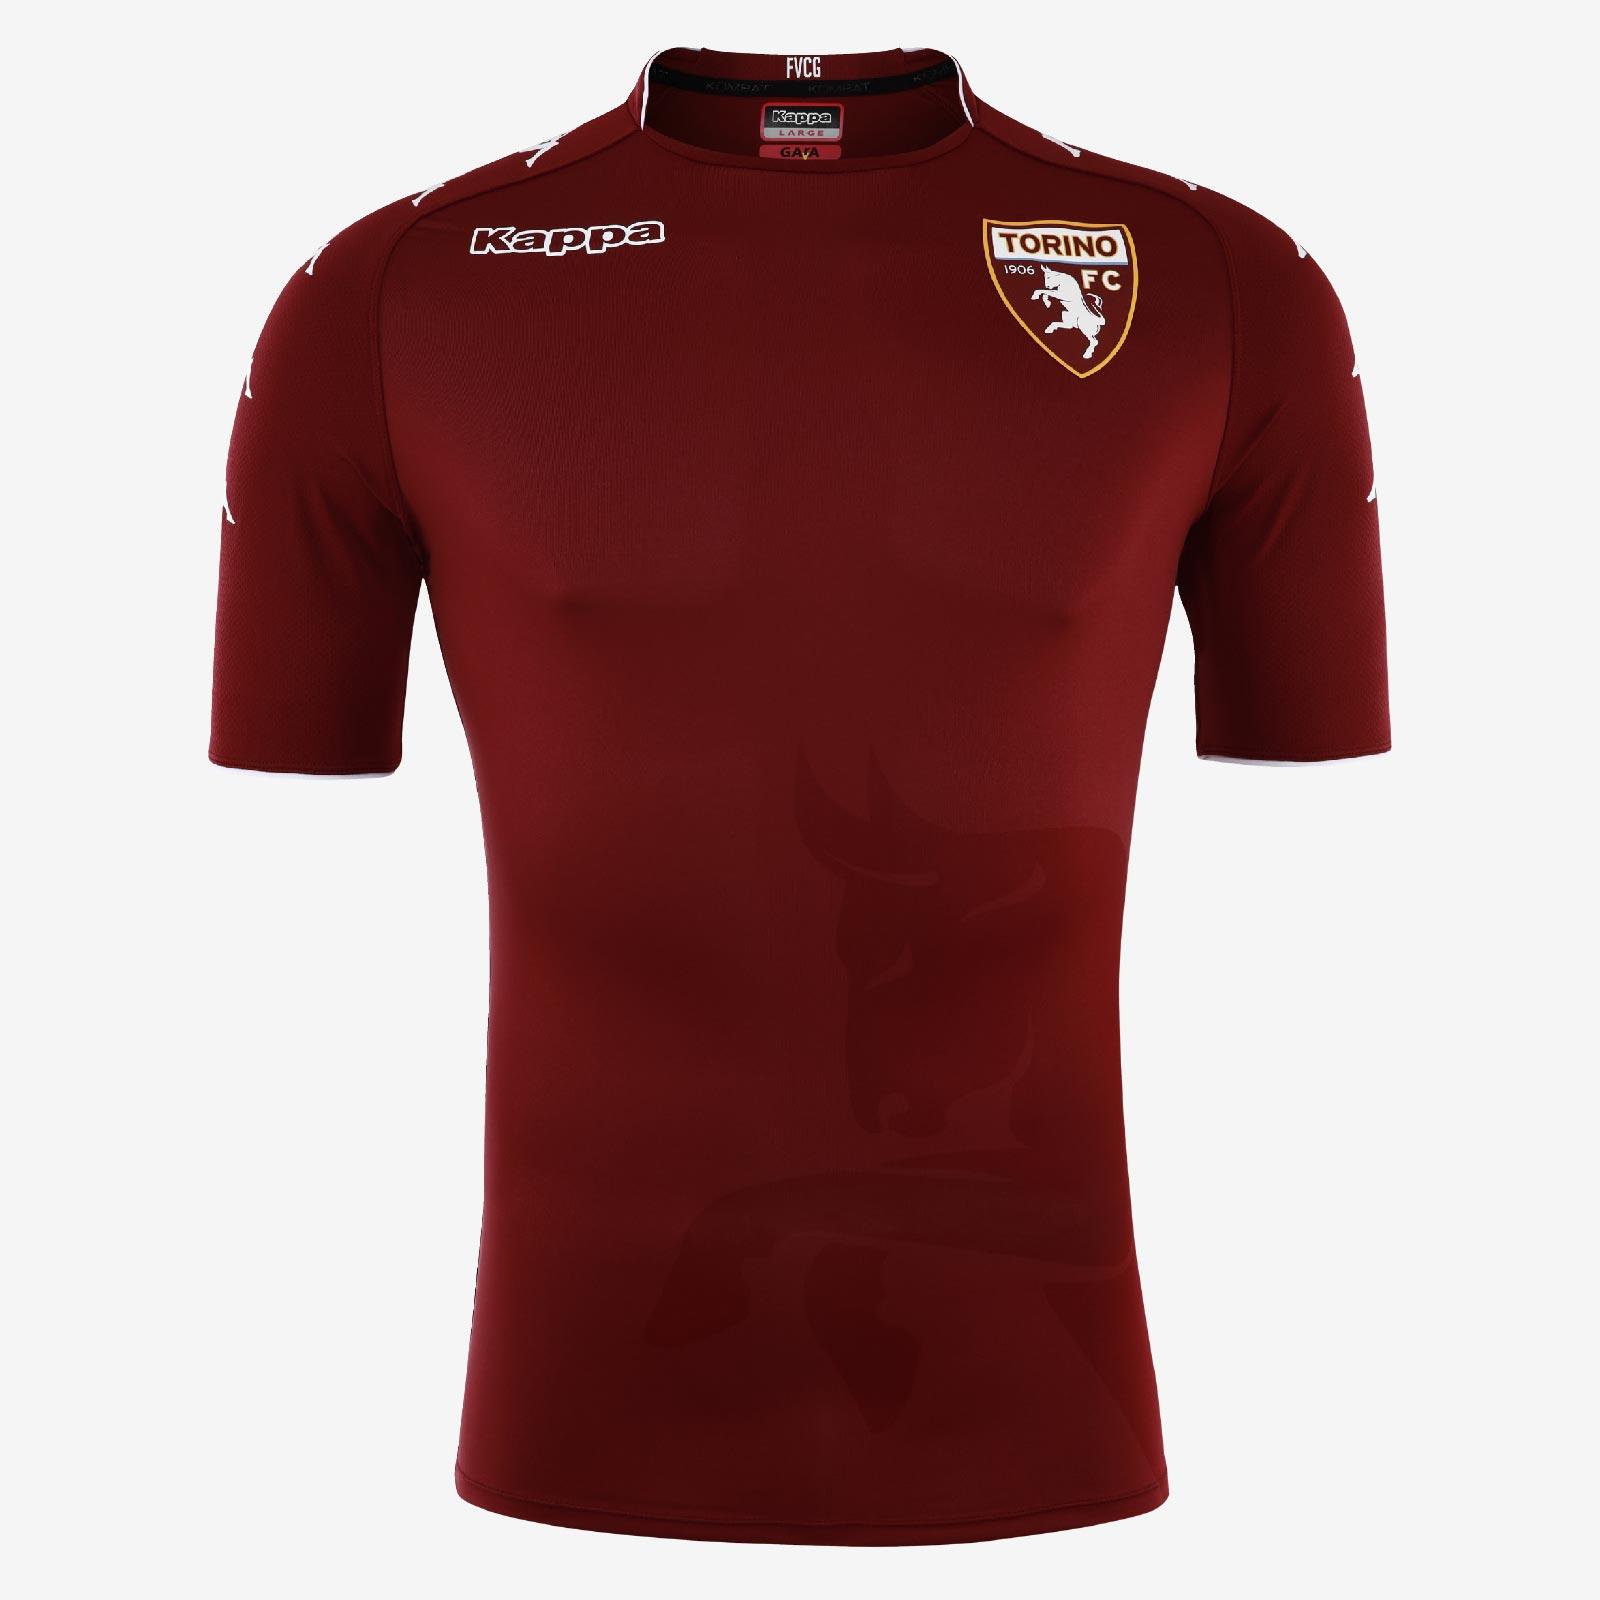 Torino 17 18 home kit revealed footy headlines for Kit tornio